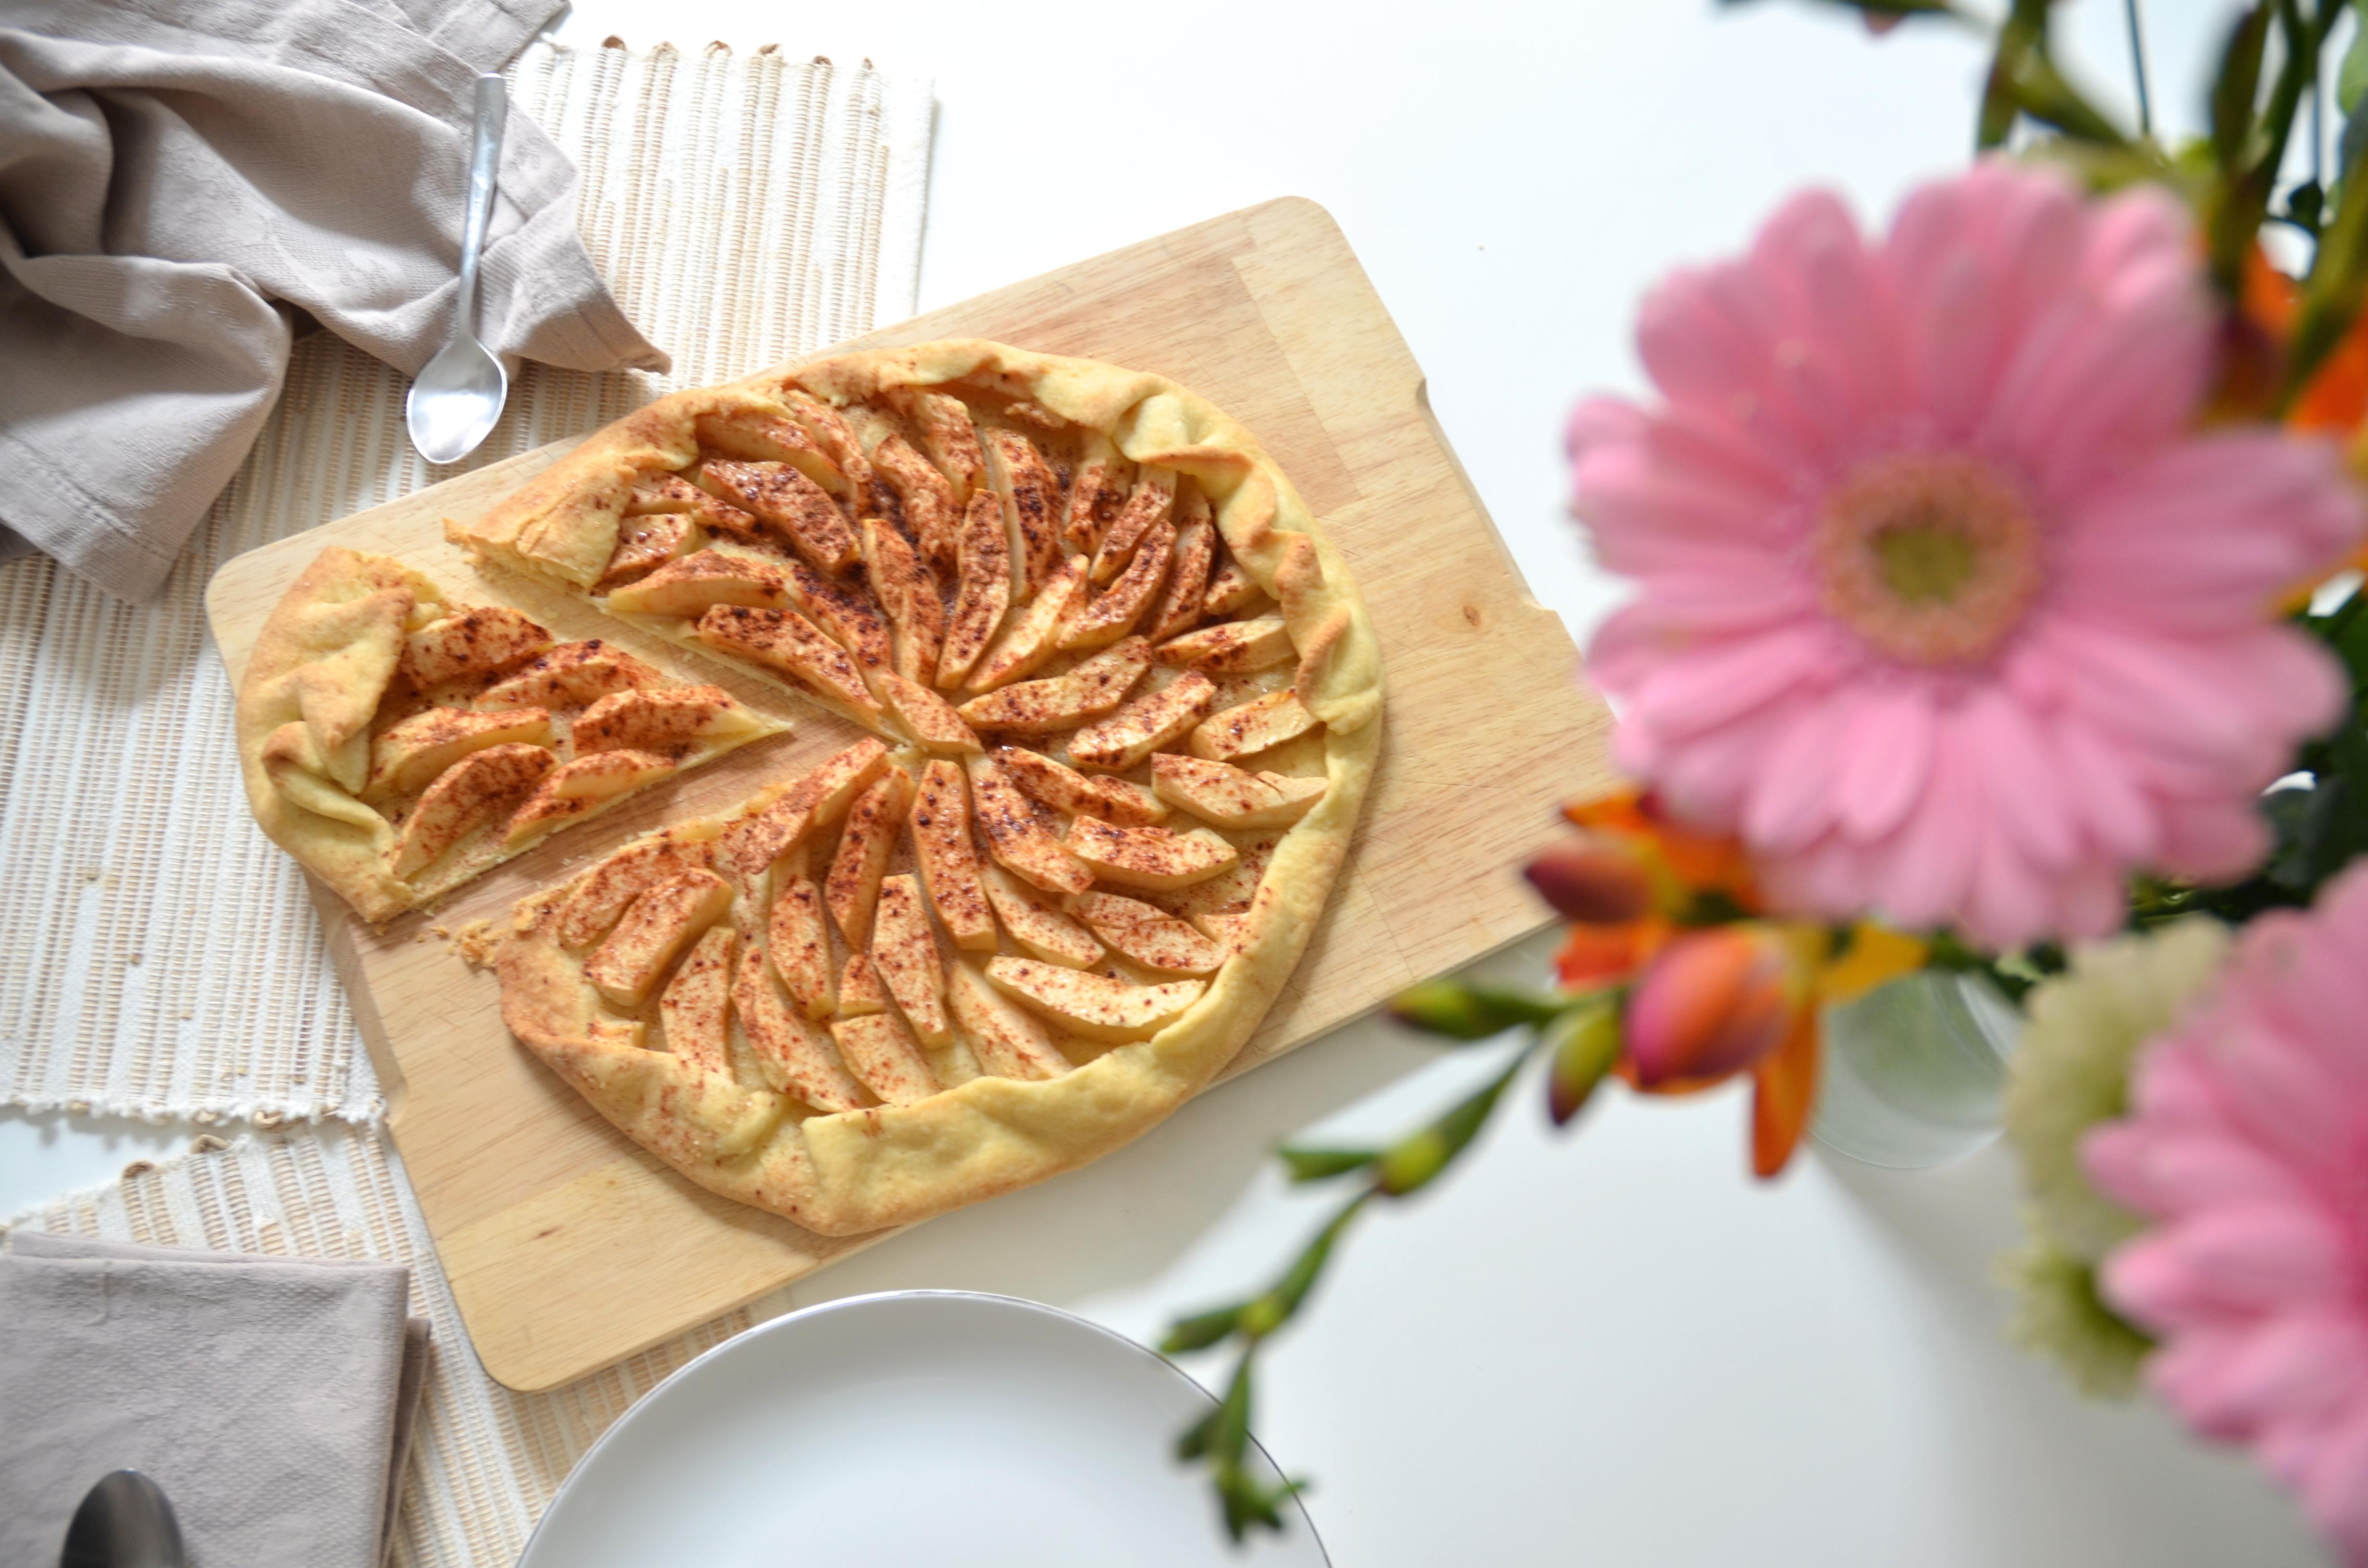 blog-mode-beaute-lifestyle-food-recette-cuisine-deco-voyage-strasbourg